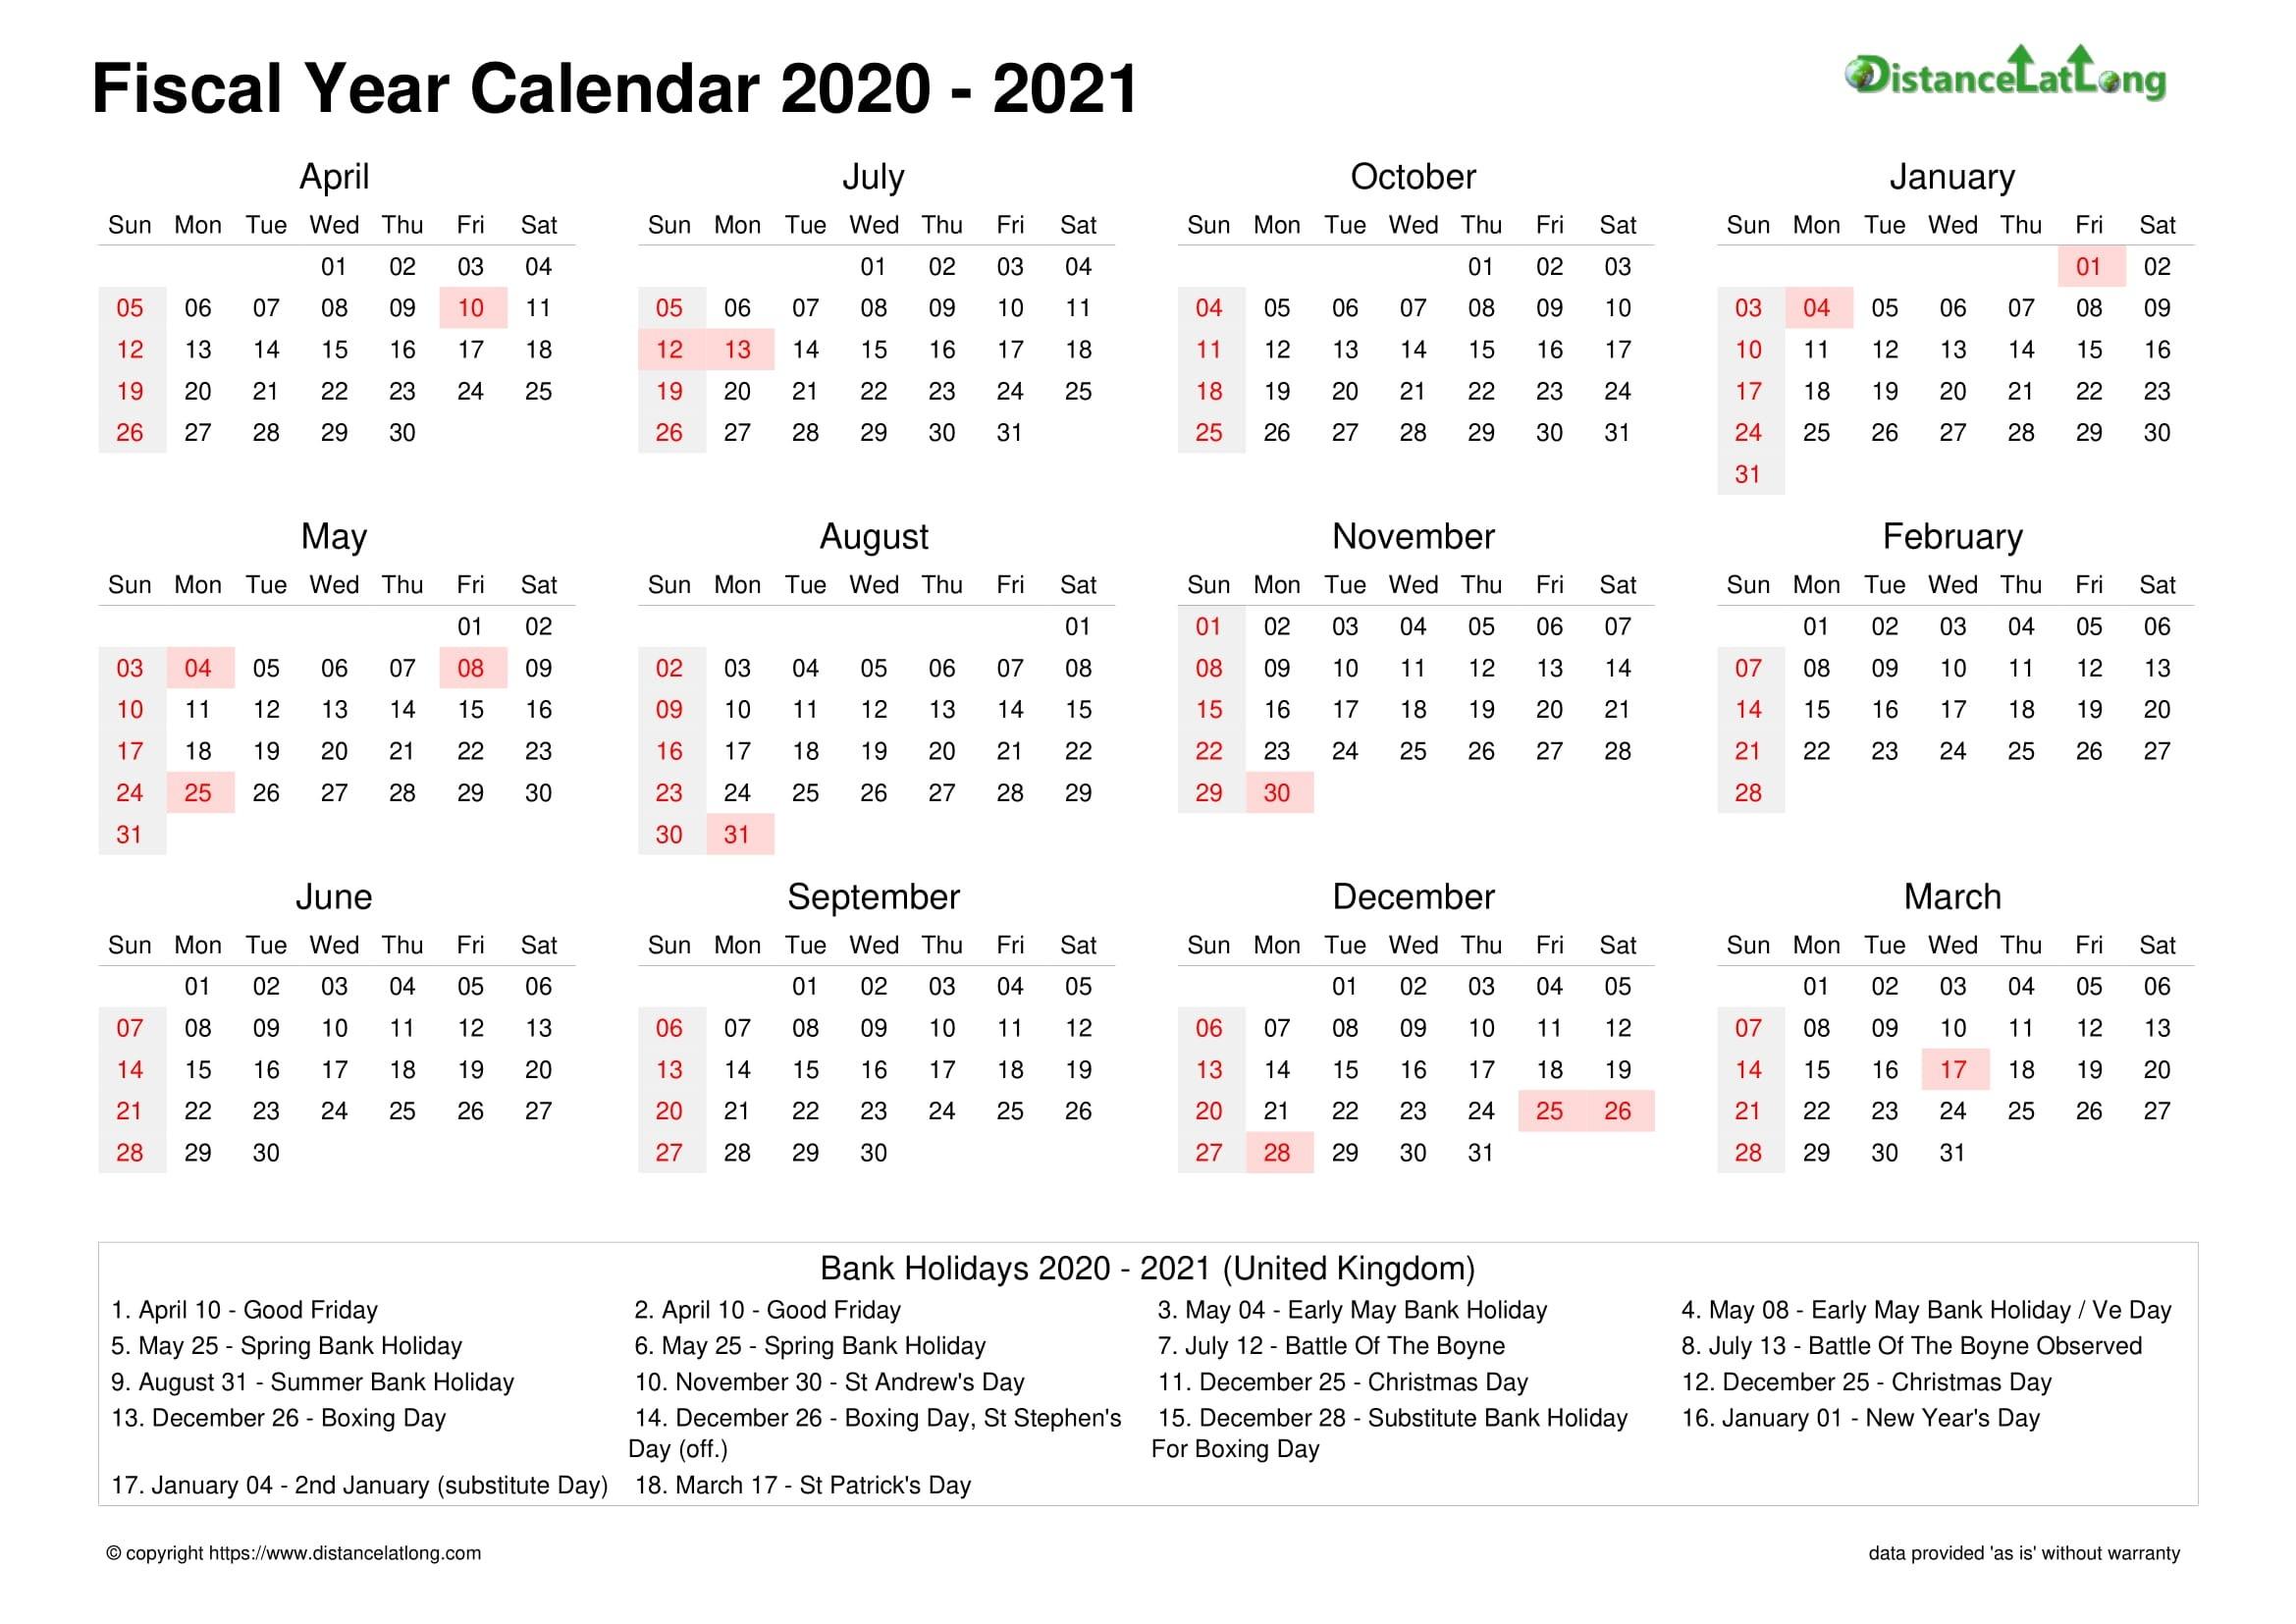 Fiscal Year 2020-2021 Calendar Templates, Free Printable  Financial Year 2021 19 Australia